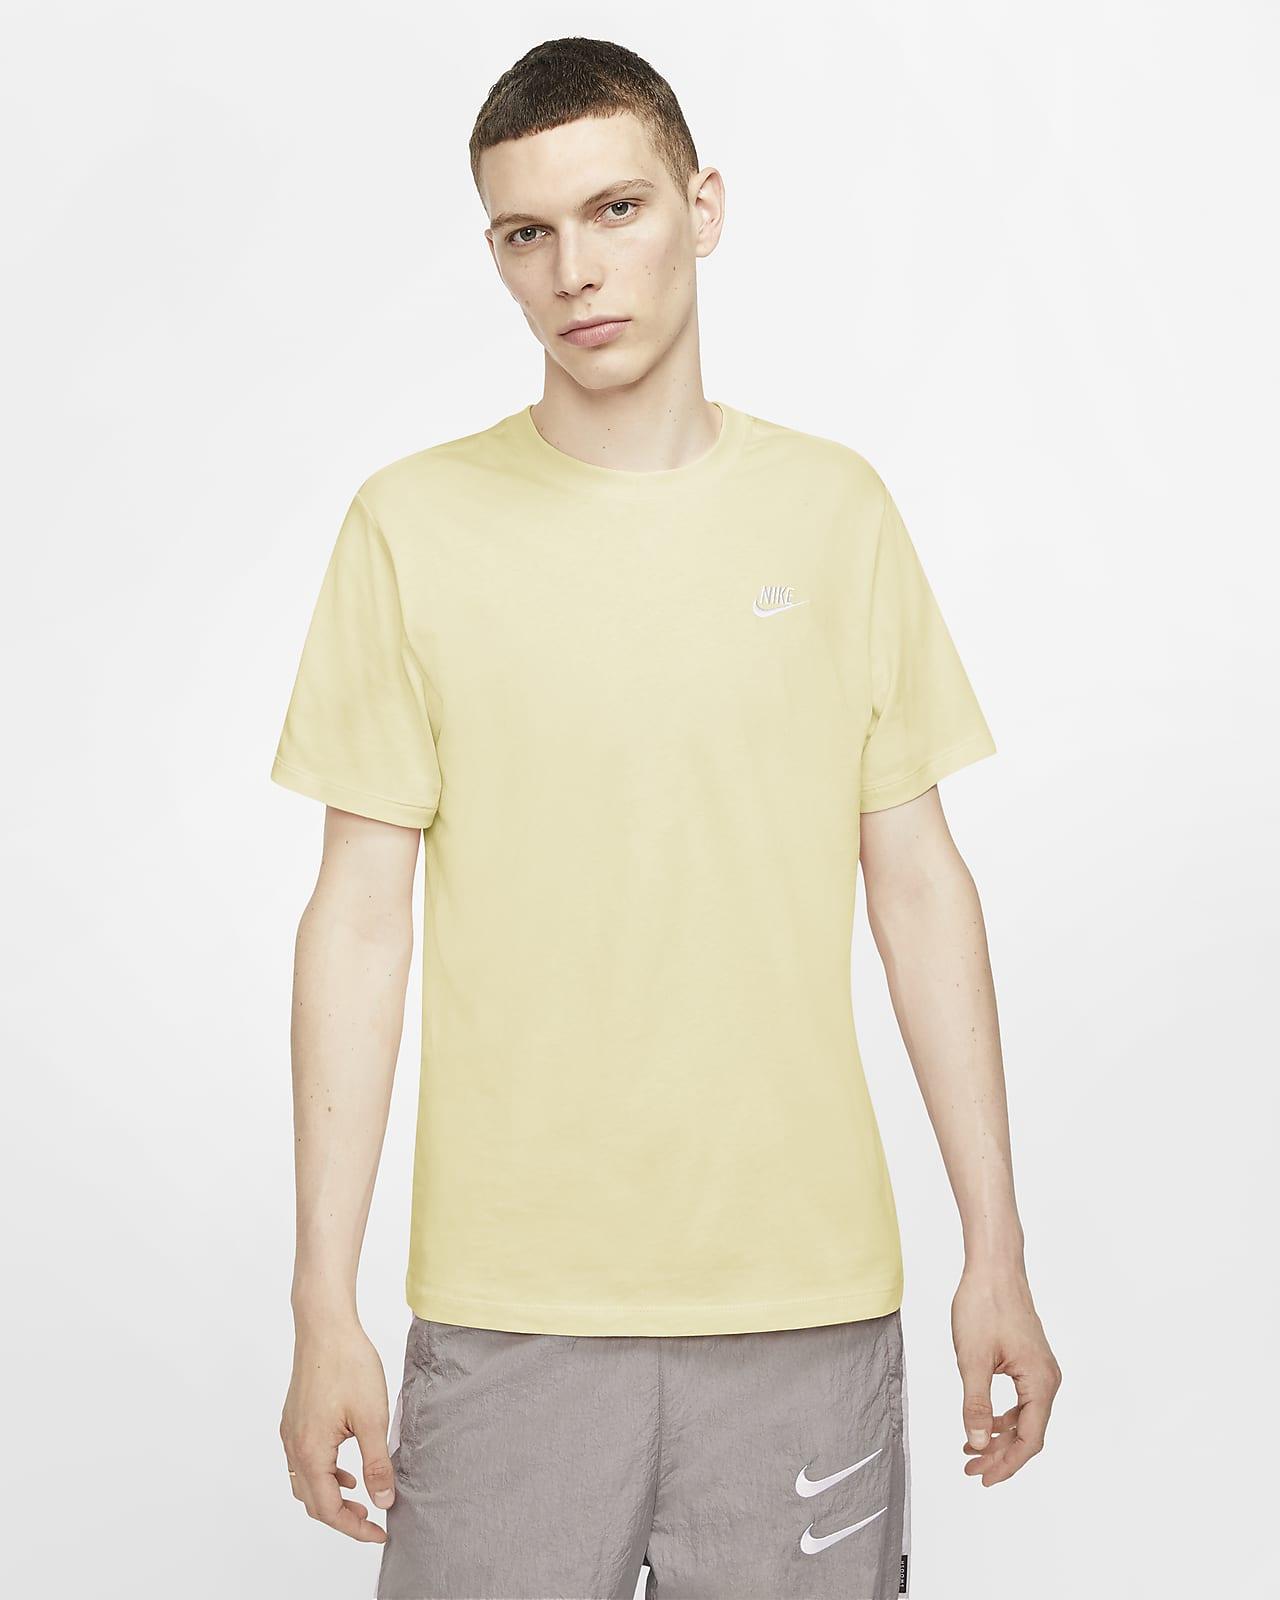 Tee-shirt Nike Sportswear Club pour Homme